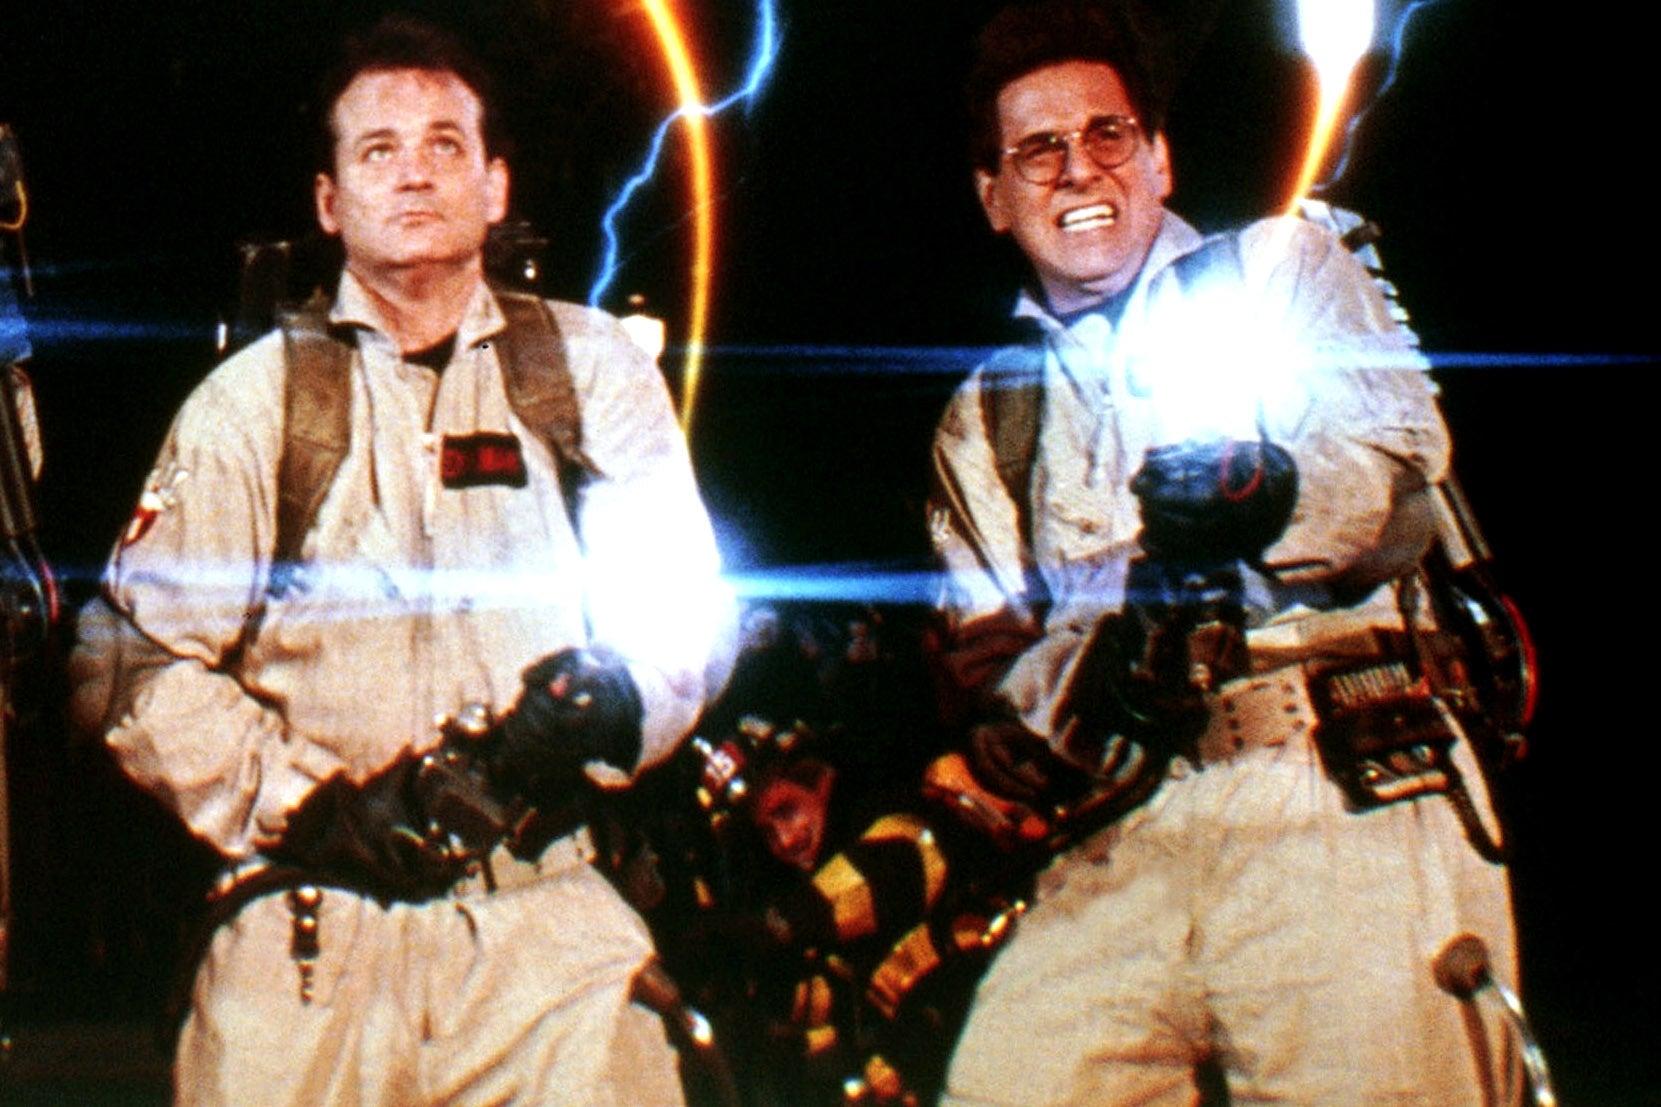 Ghostbusters 3 Happening Without Director Ivan Reitman